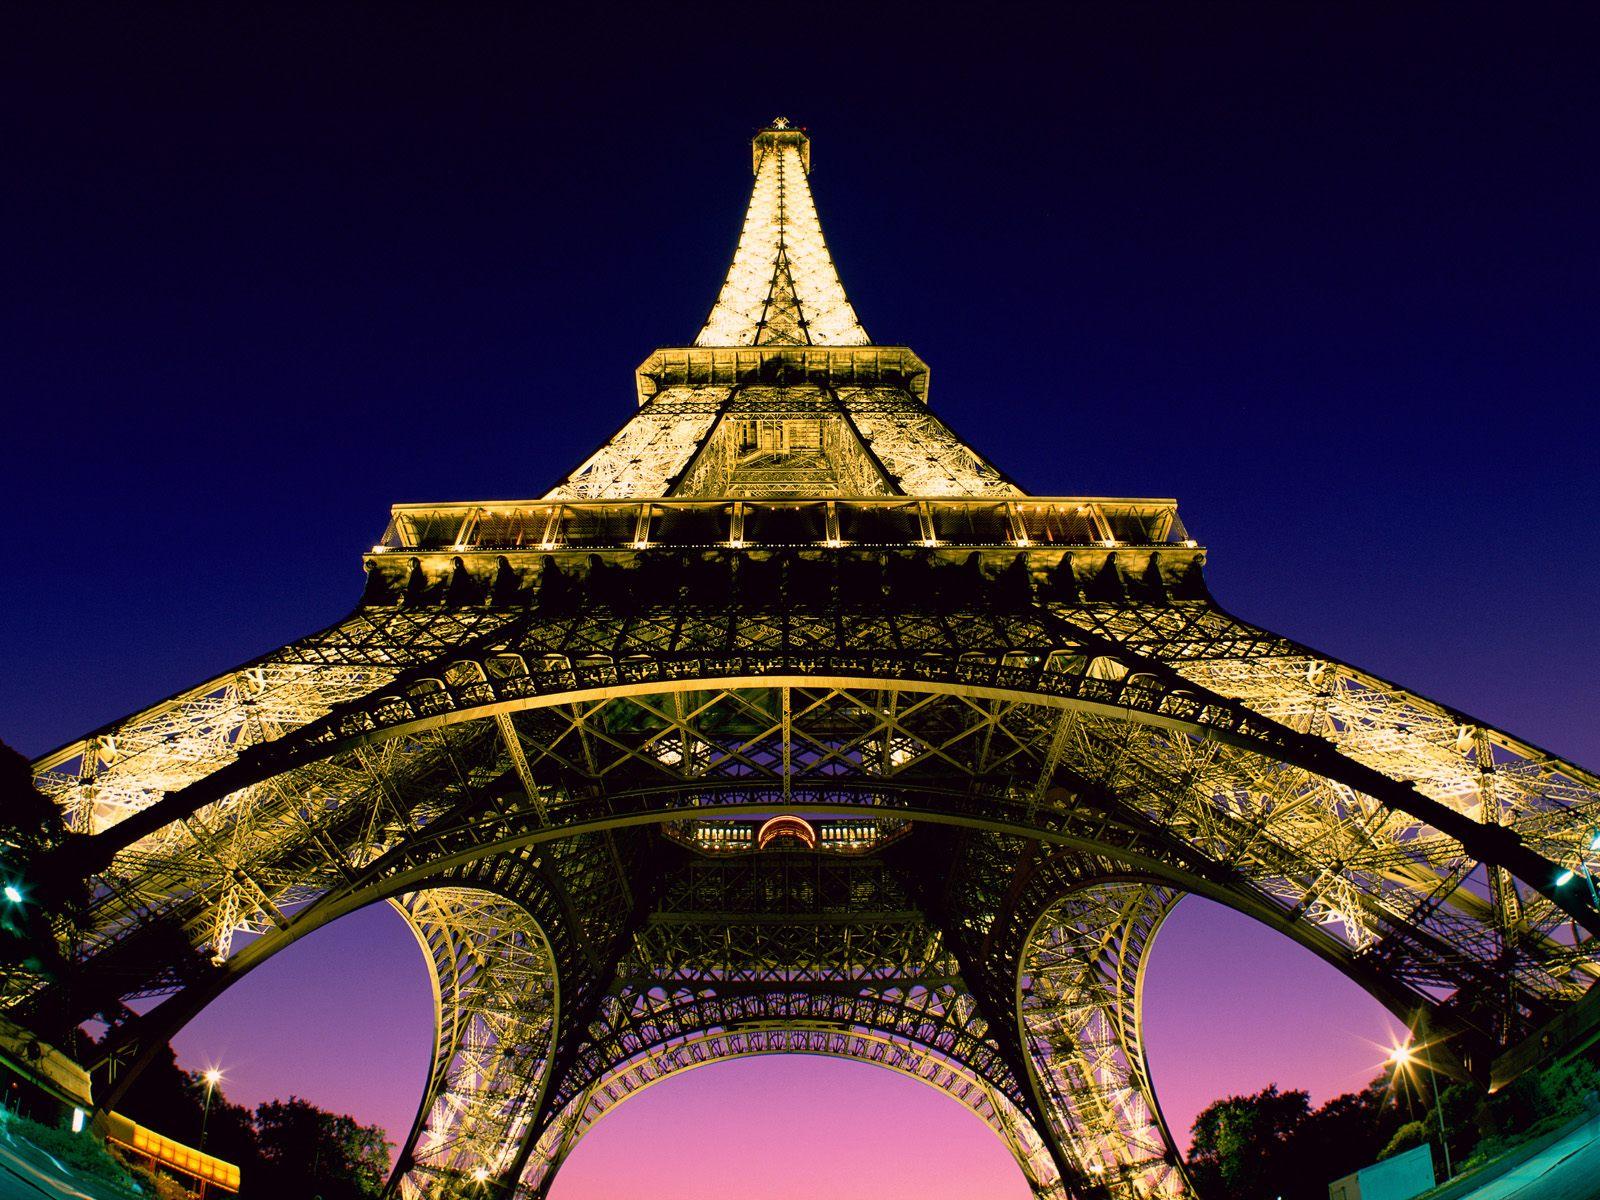 Beneath The Eiffel Tower Paris France